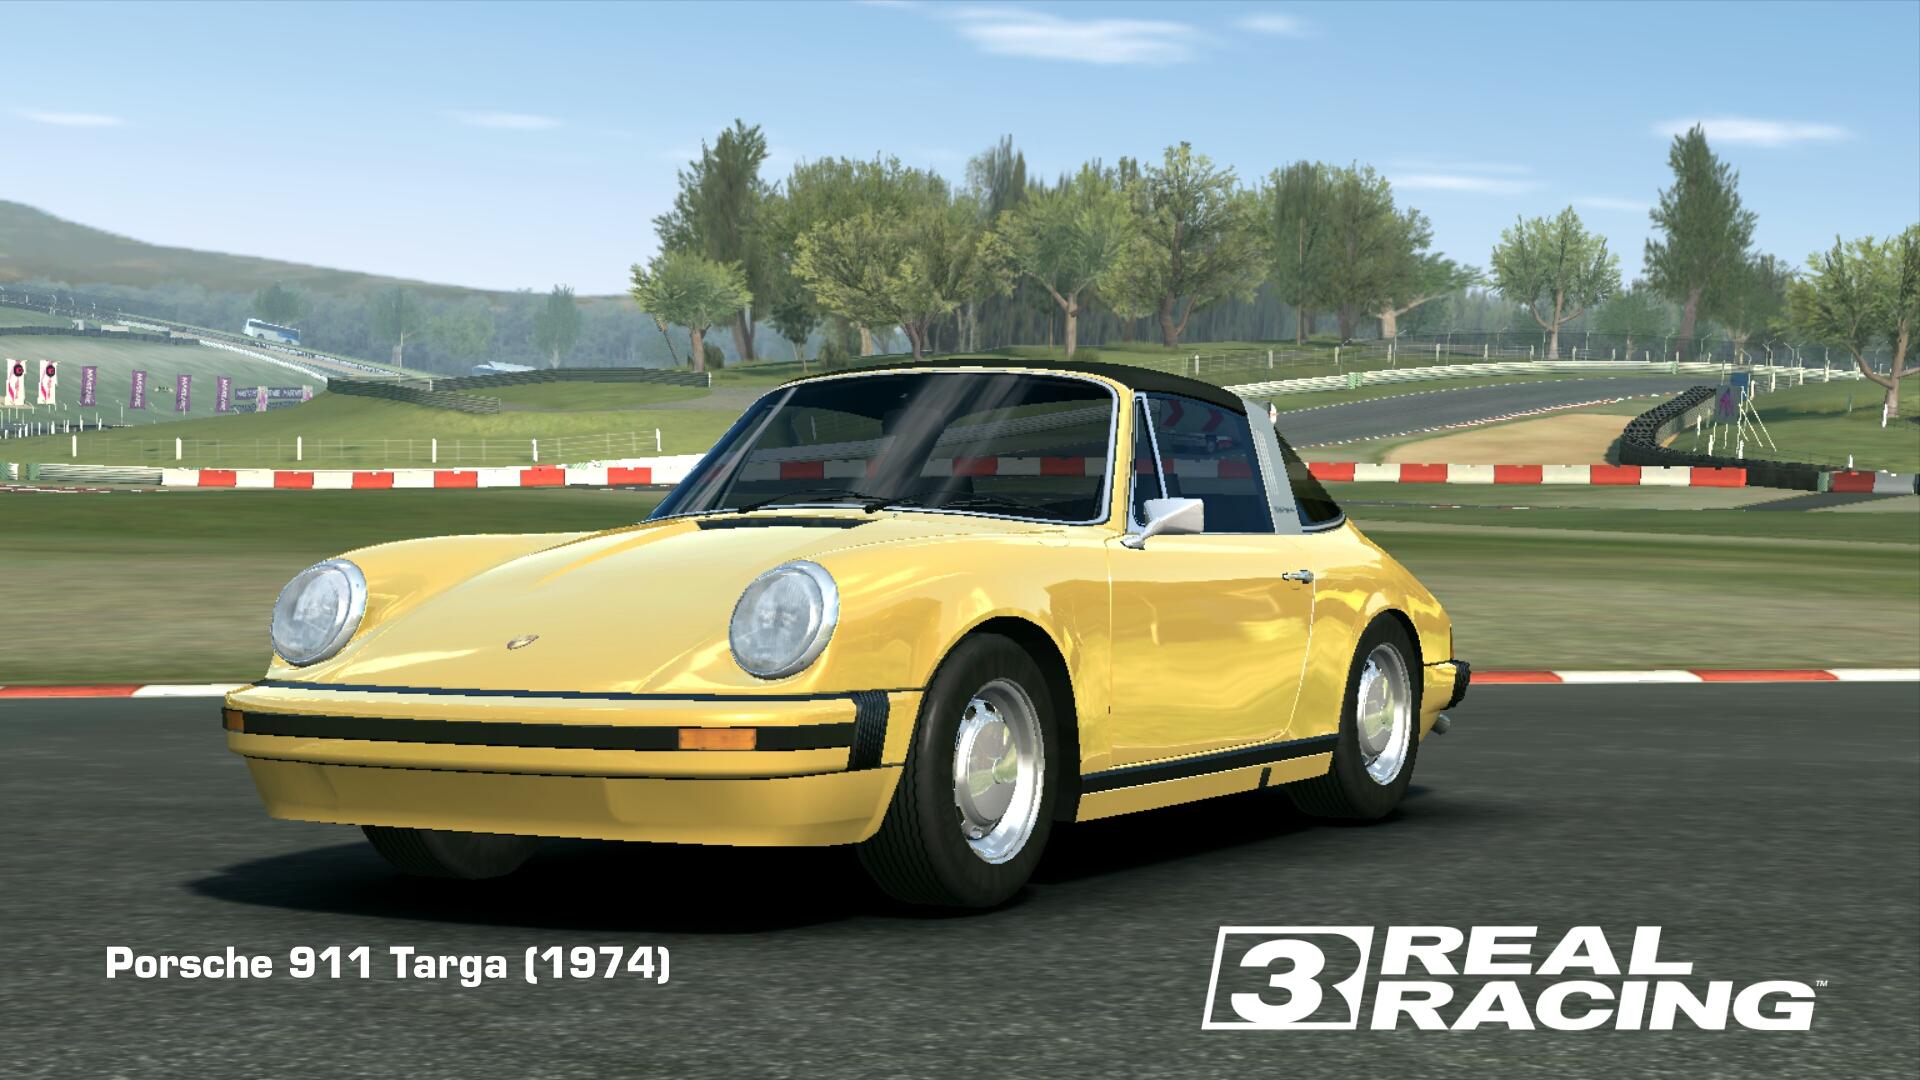 Showcase Porsche 911 Targa (1974)